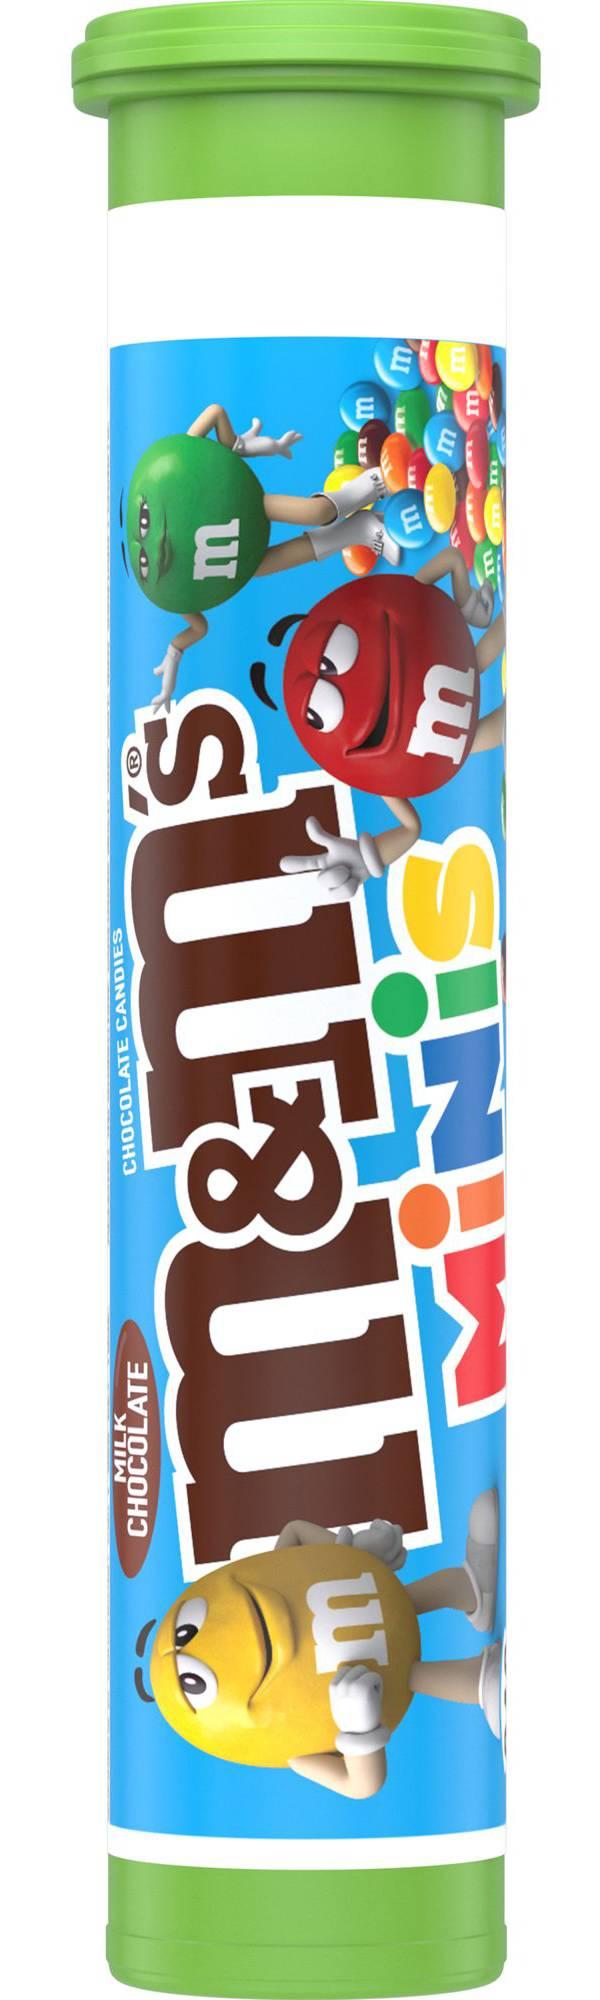 M&M's Milk Chocolate Mega Mini Candy Tube product image